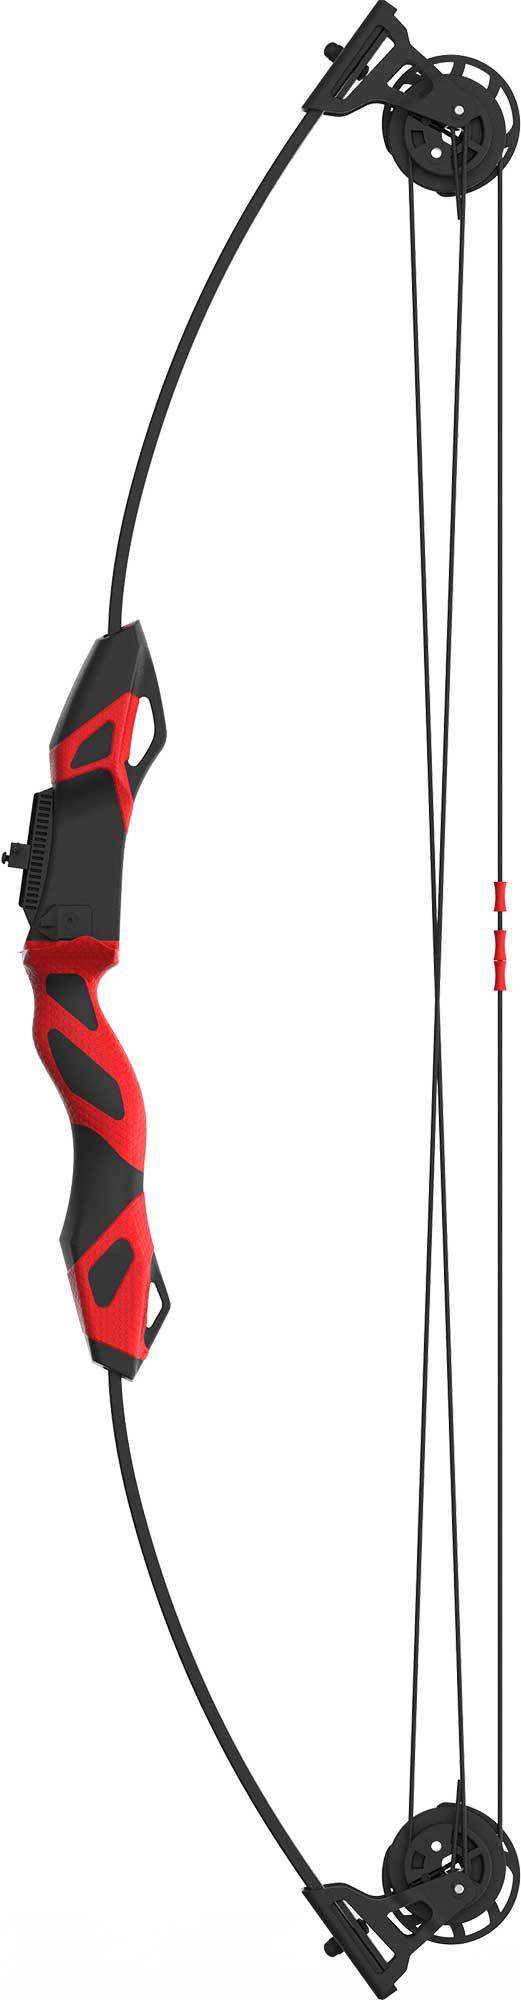 Barnett Vertigo Youth Compound Bow Package, Size: Small thumbnail